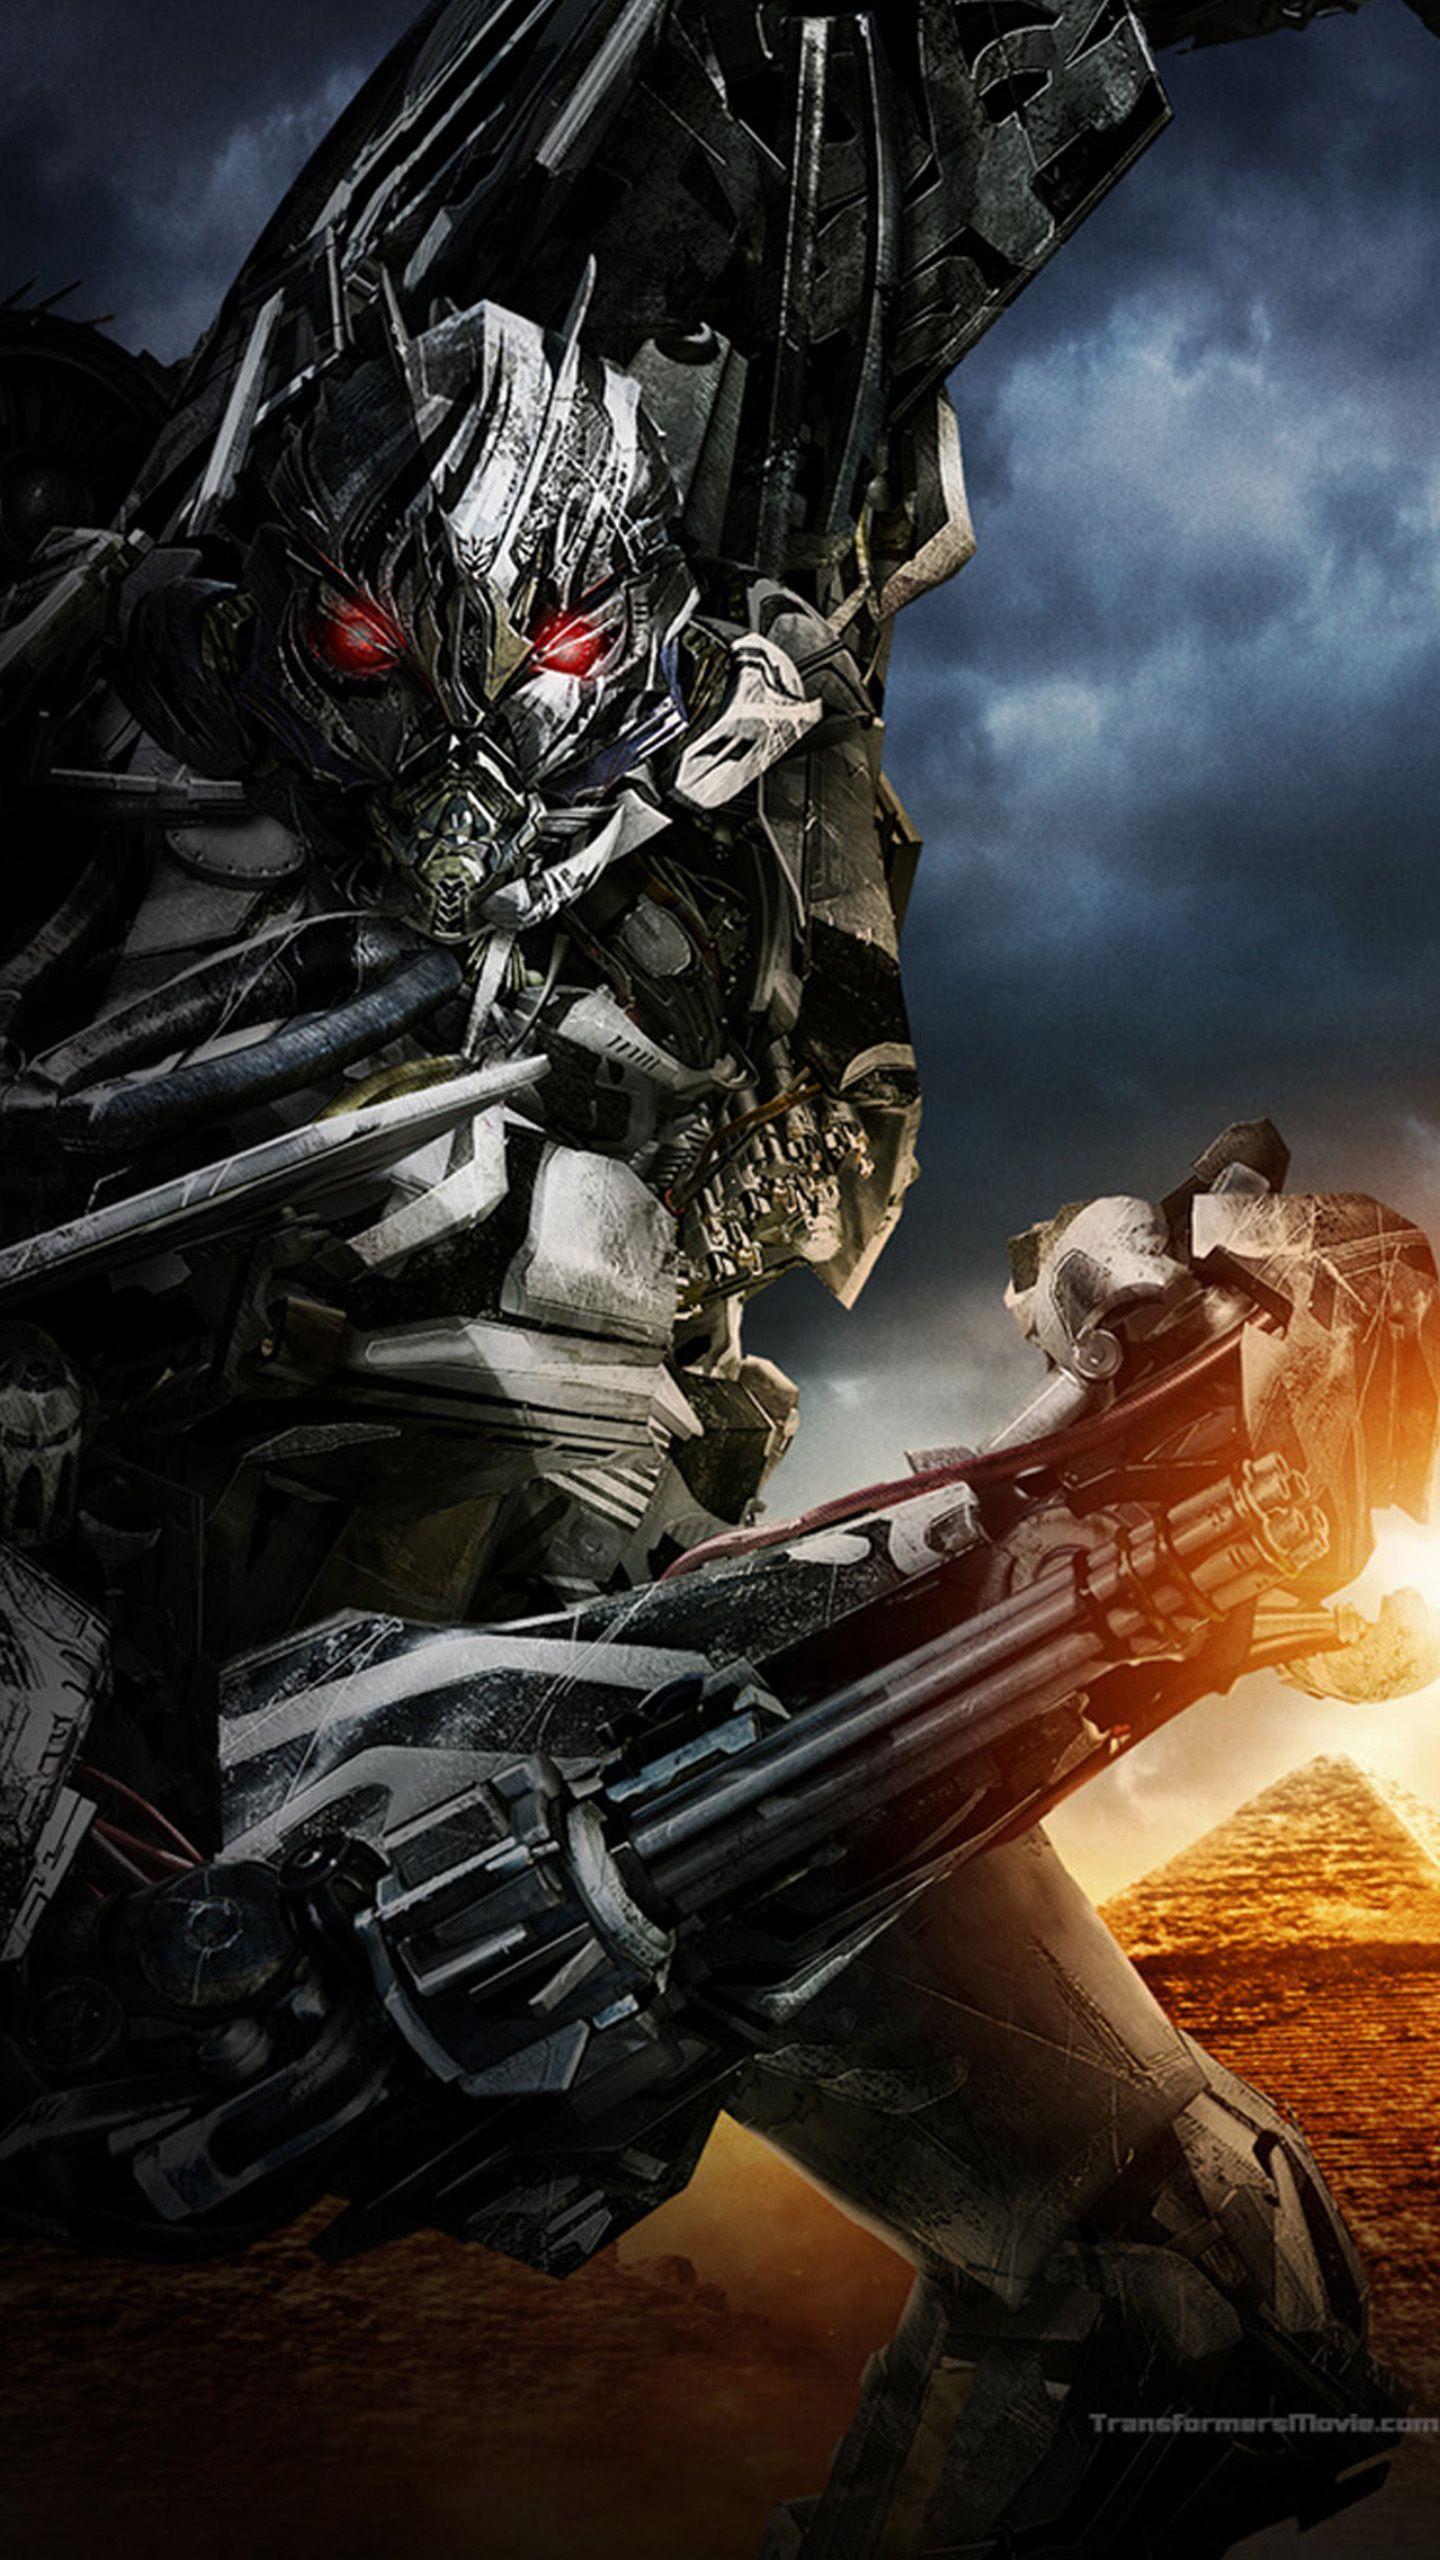 Transformers Hd Wallpaper Wallpaperesque Transformers